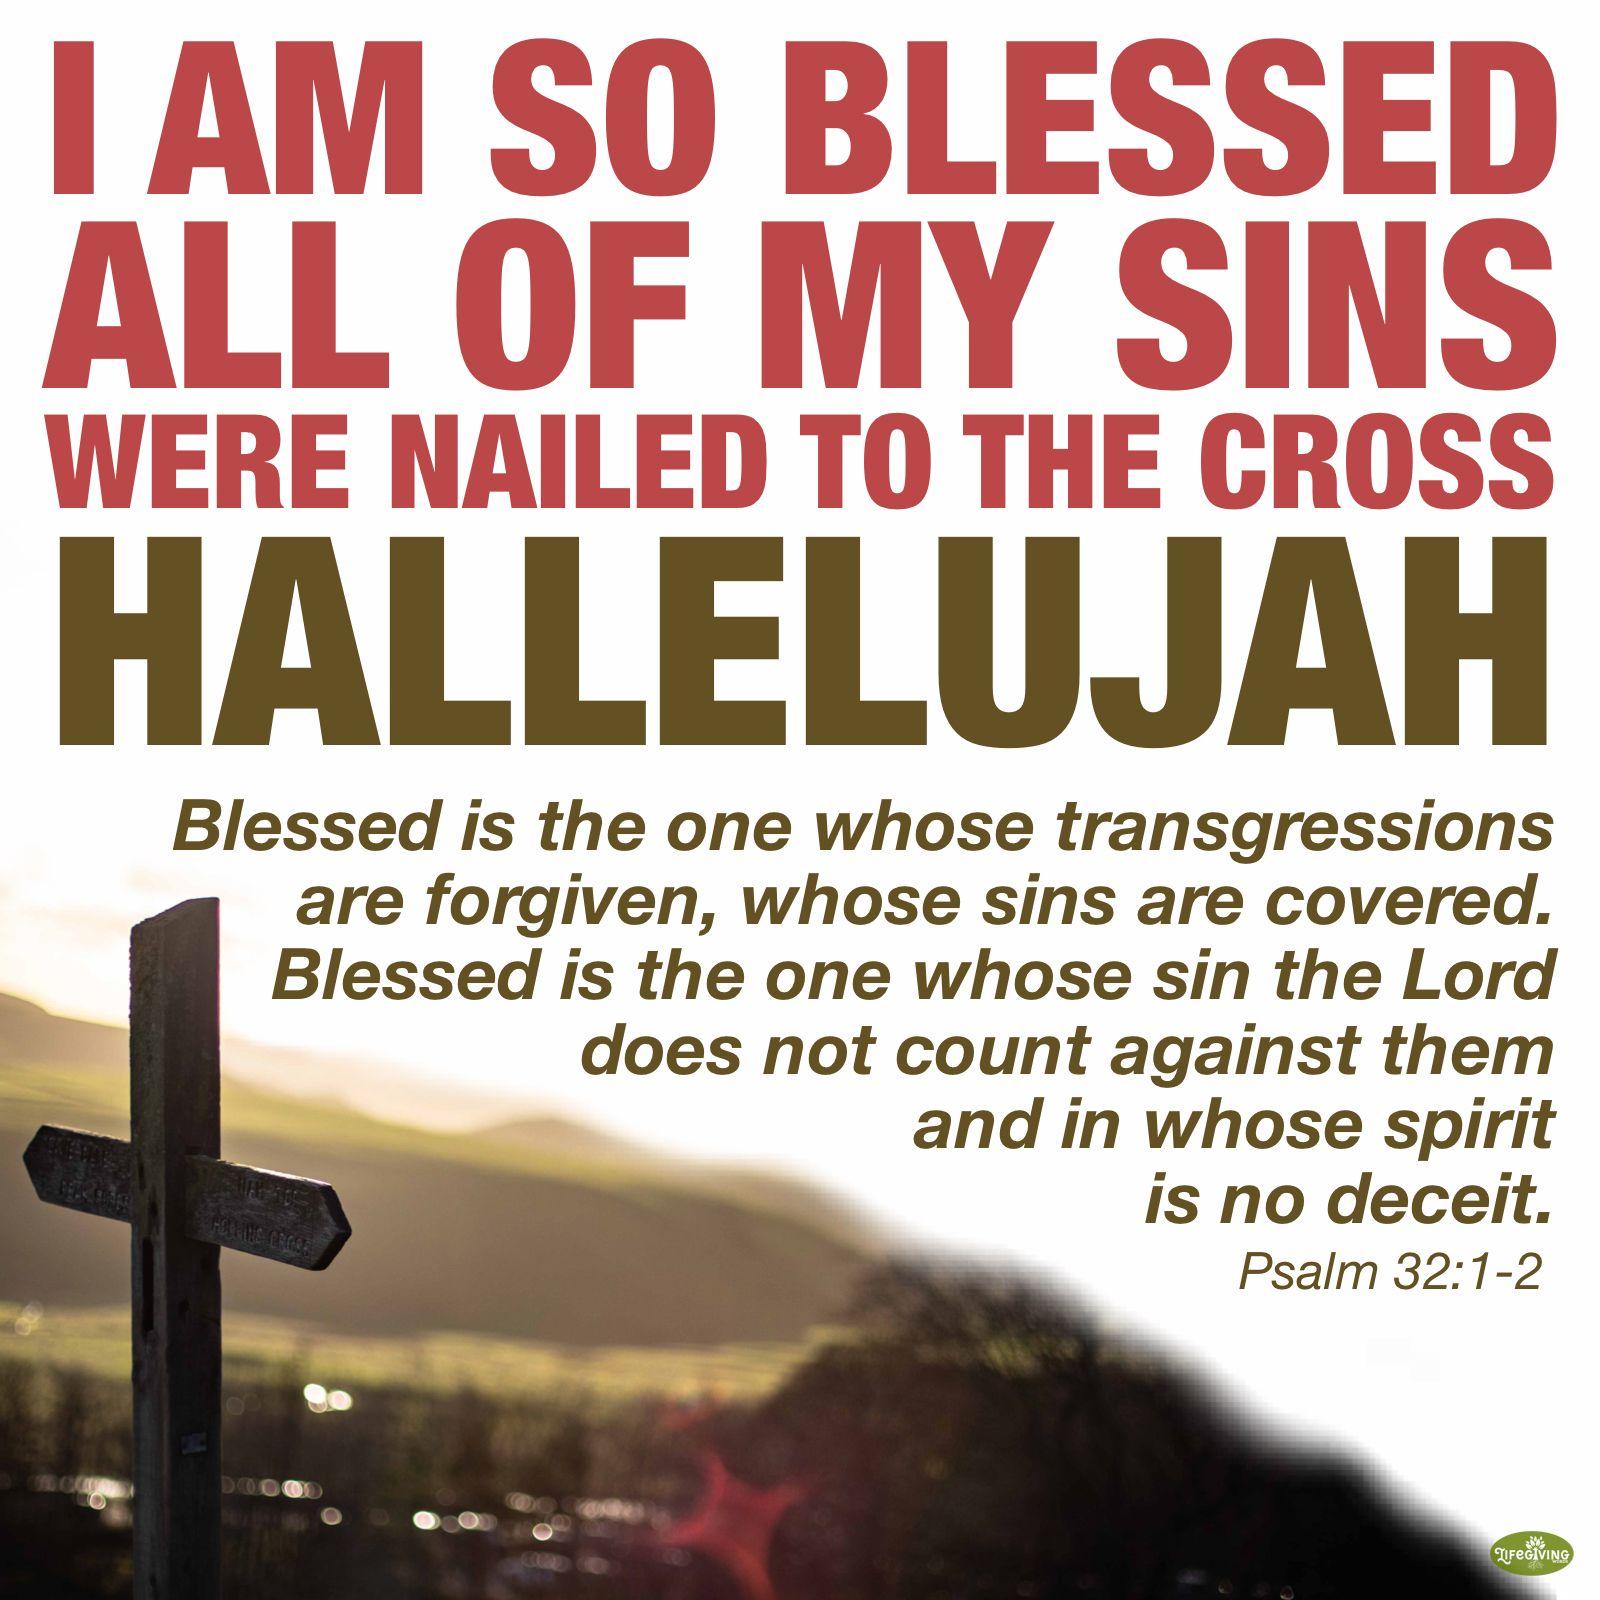 Christianity #Christian #BibleVerse #Scripture #God #Jesus